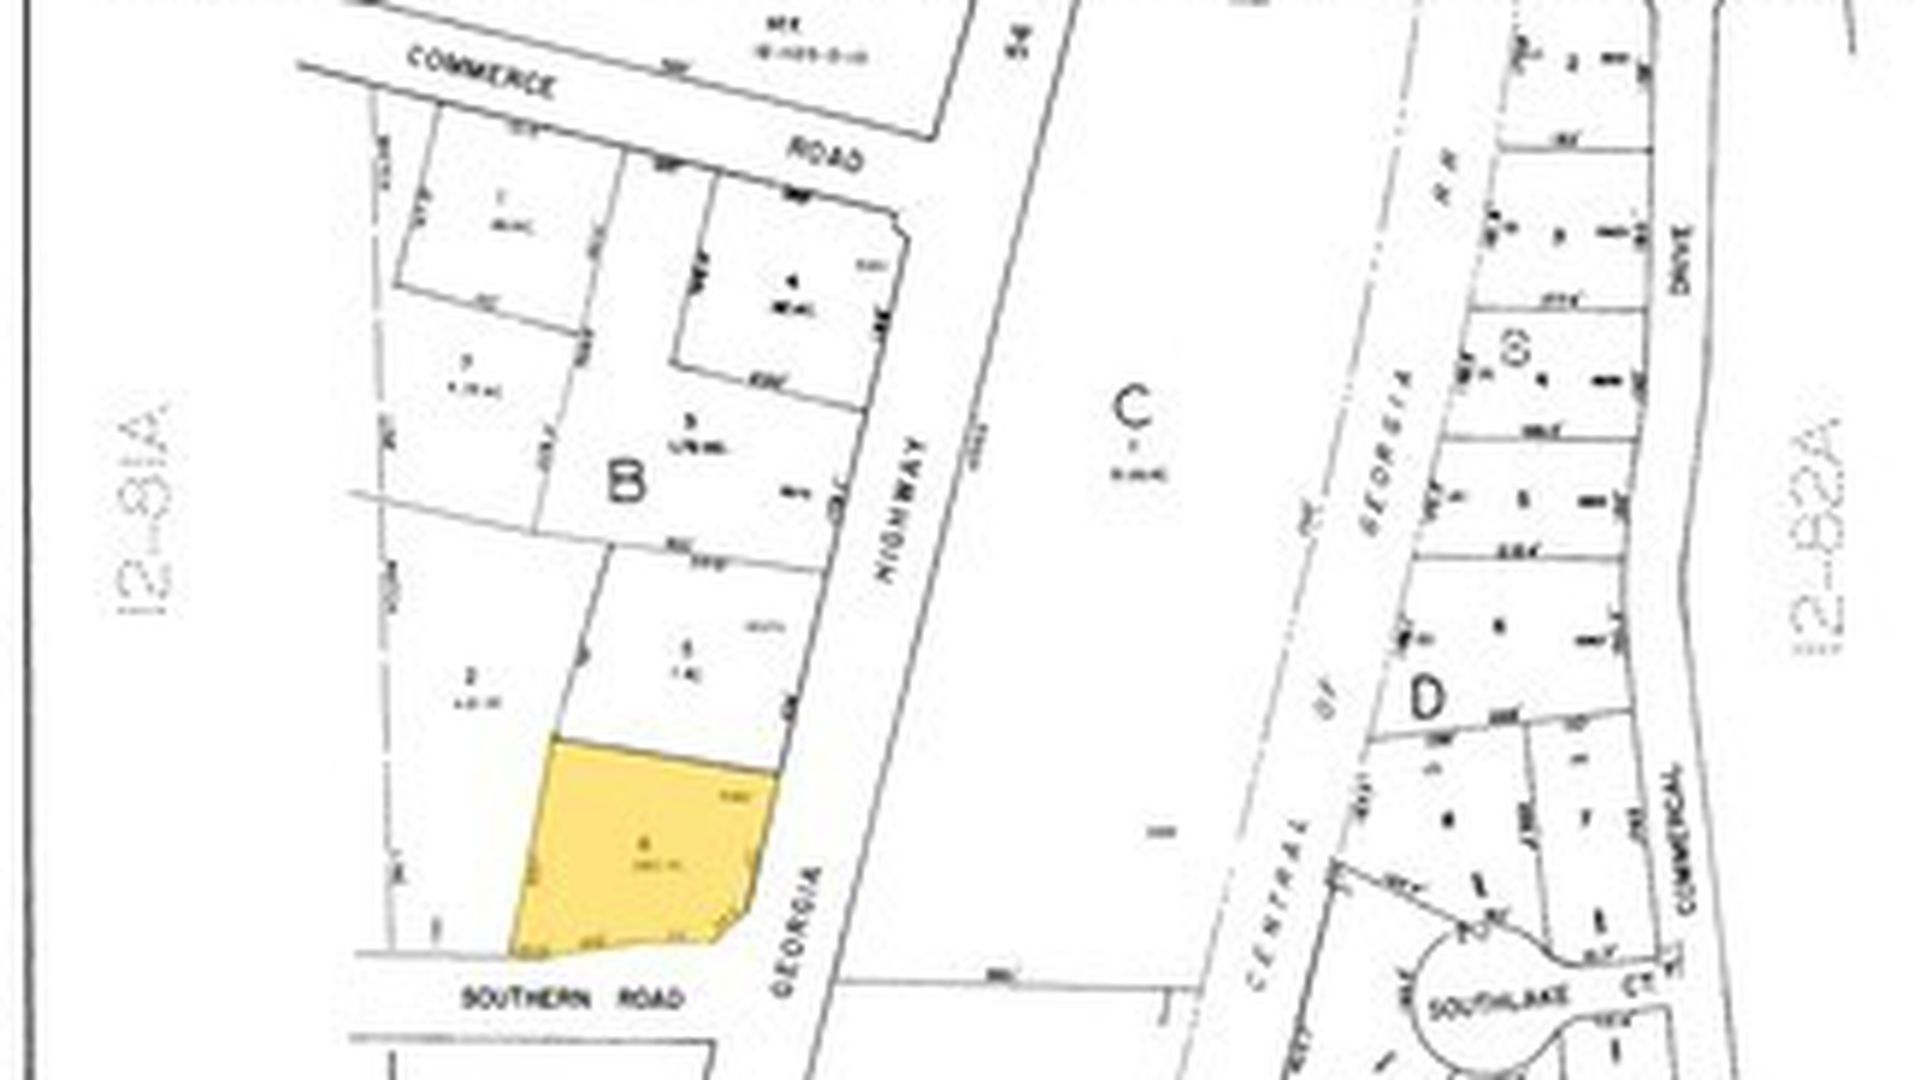 6987 Jonesboro Hwy, Morrow, GA 30260 United States